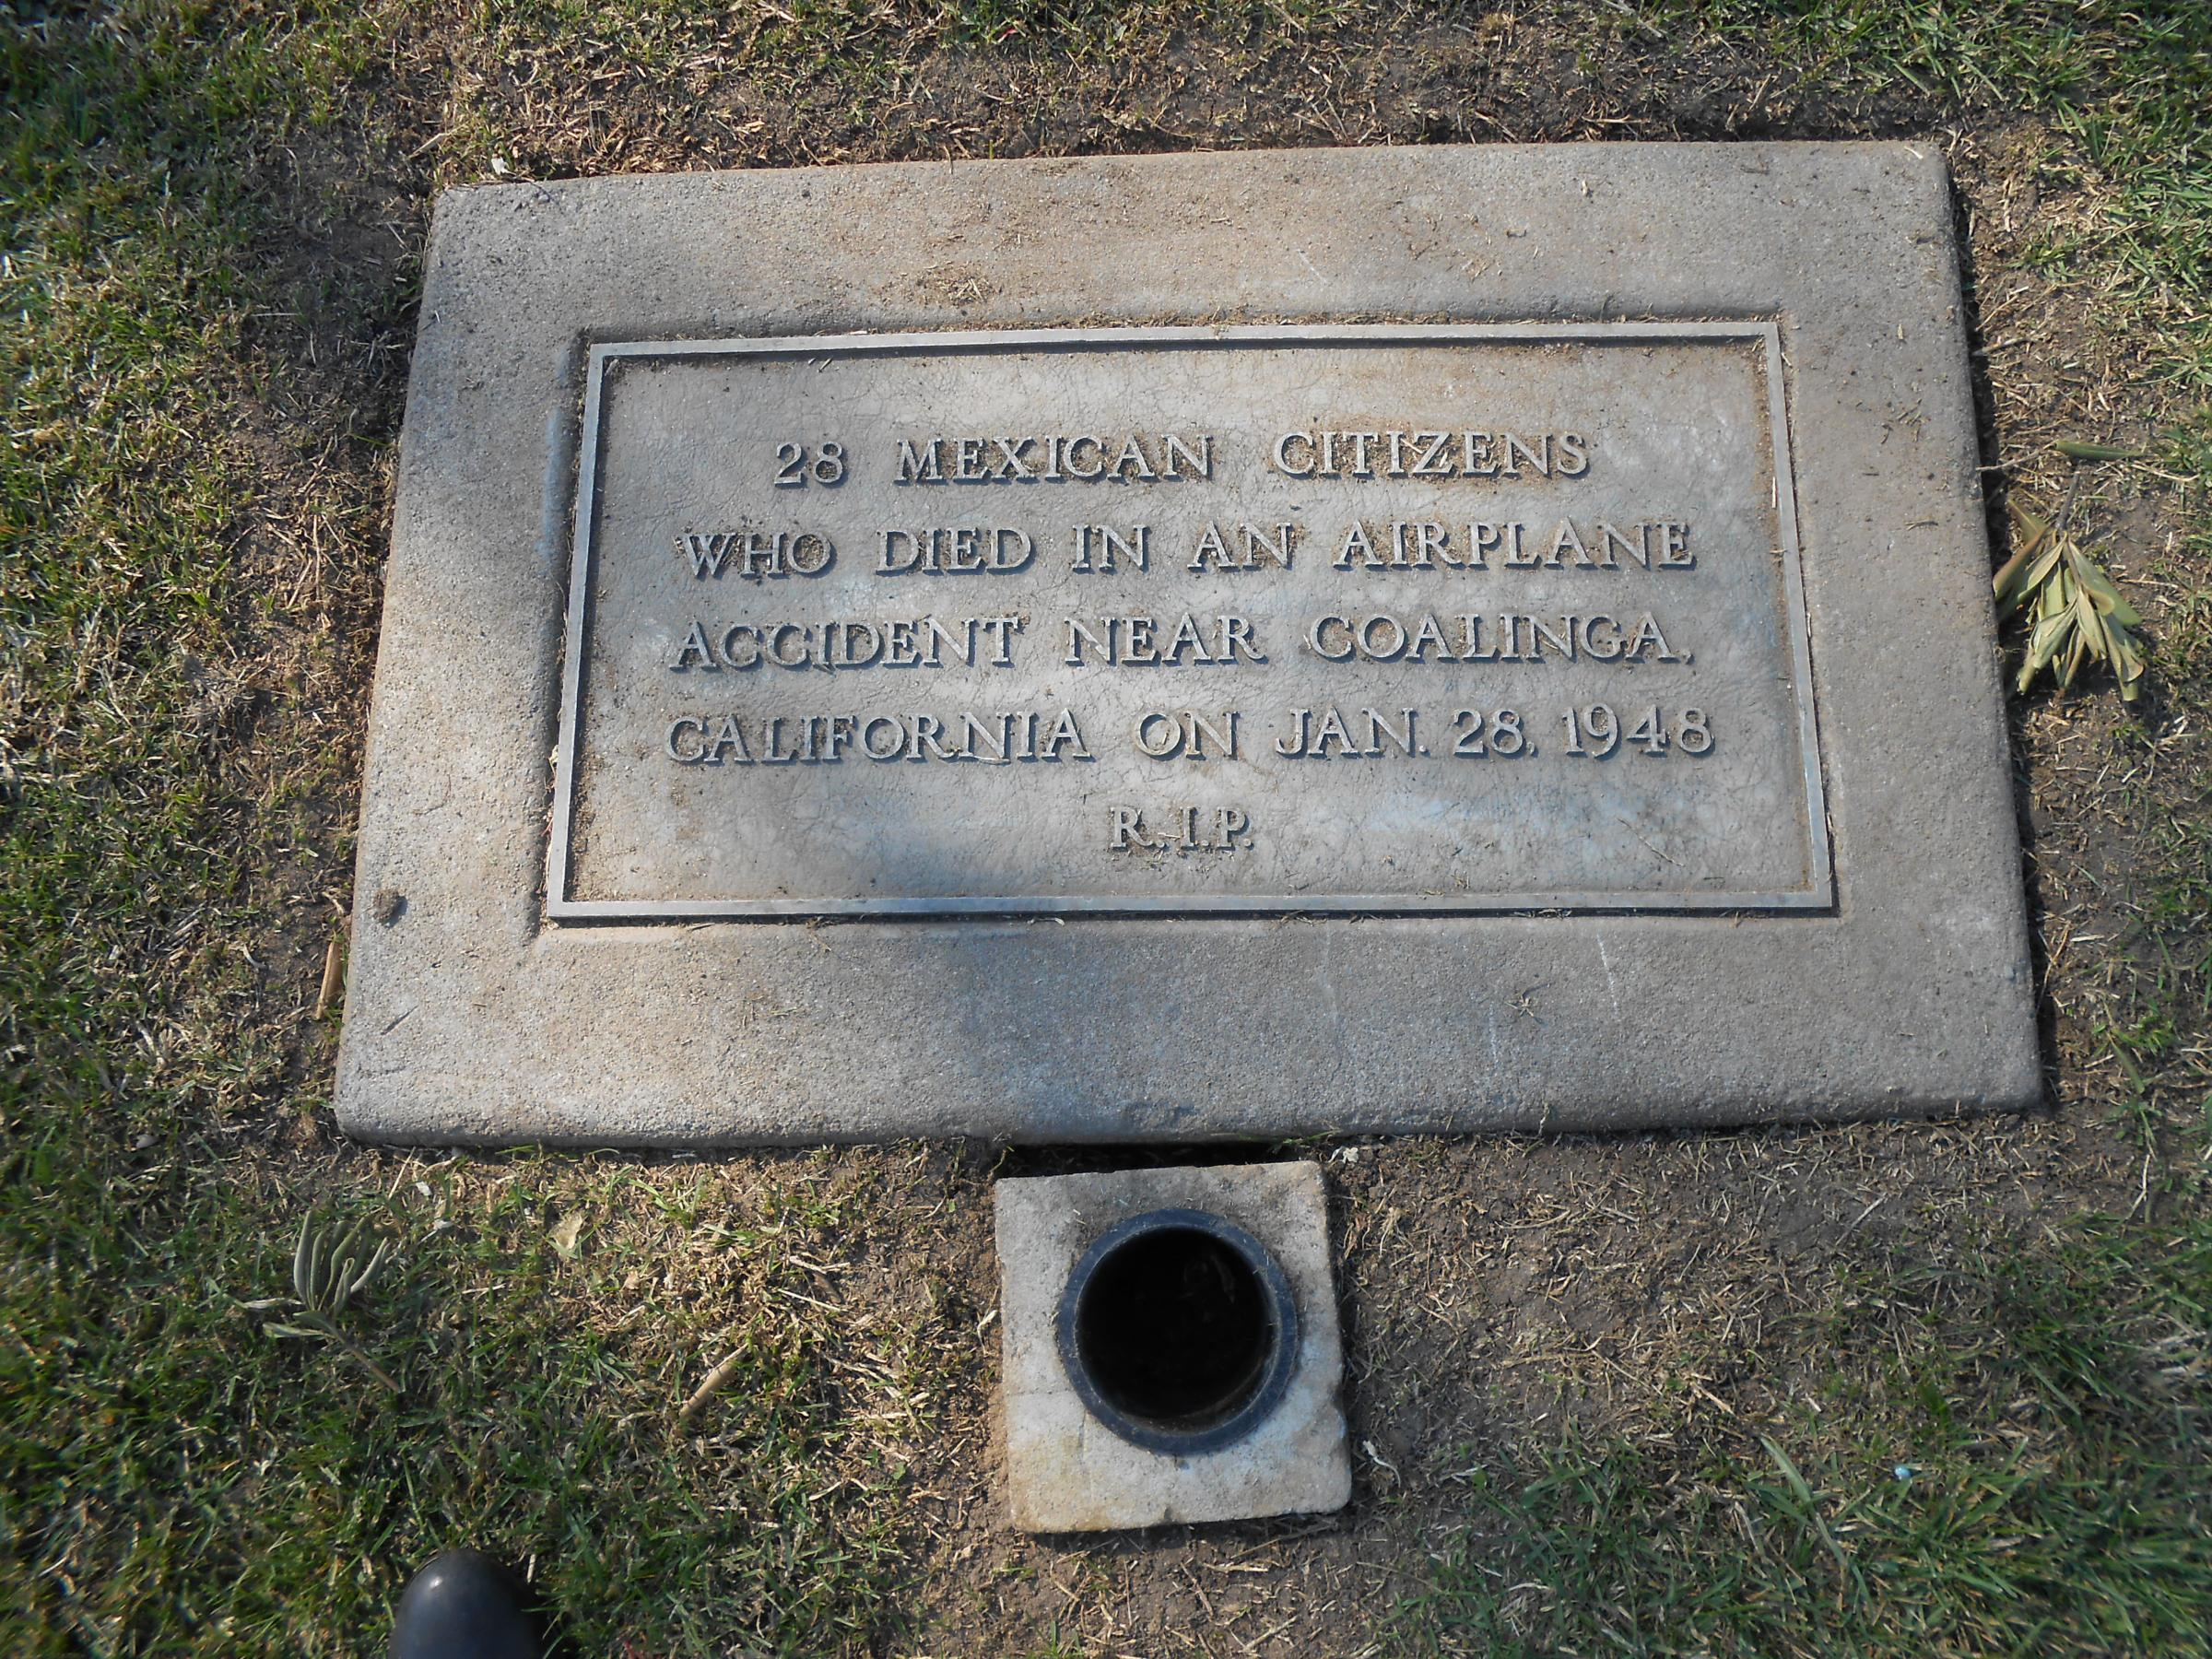 The original grave marker